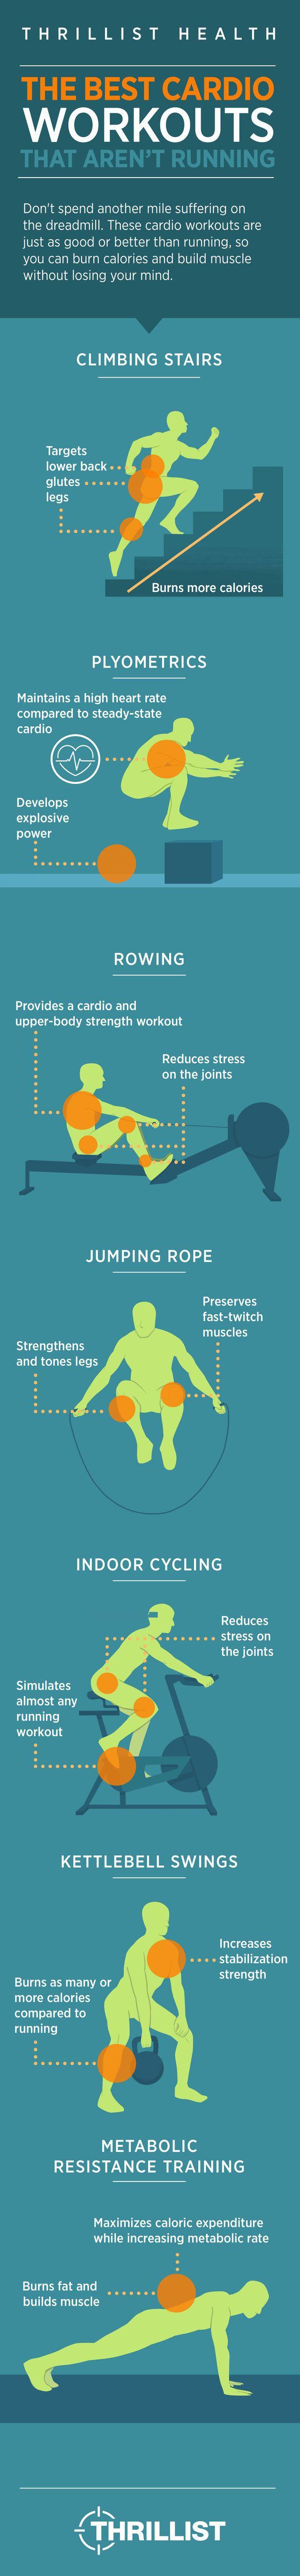 Underrated Cardio Workouts That Involve Zero Running  Cardio